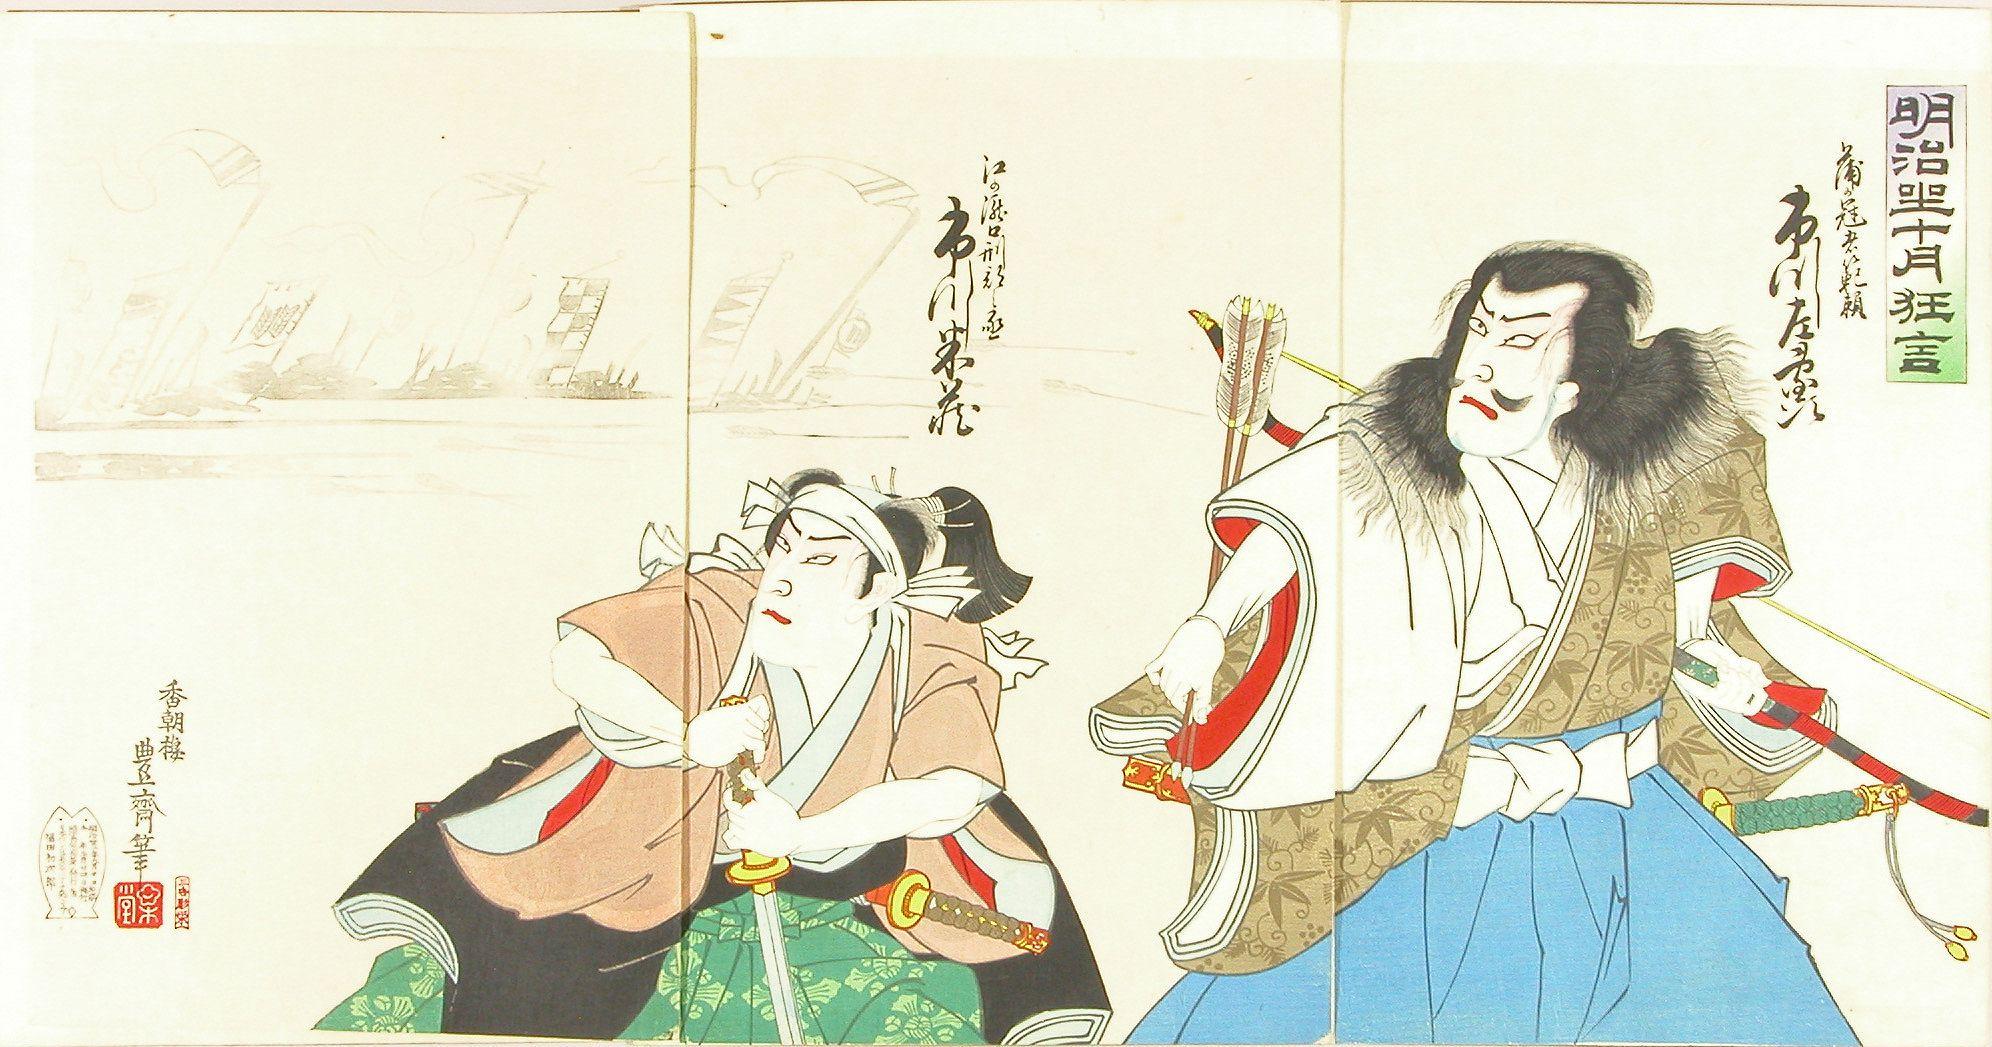 HOSAI Actors in the play <i>Kamakurayama kabazakura shigezaki</i>, triptych